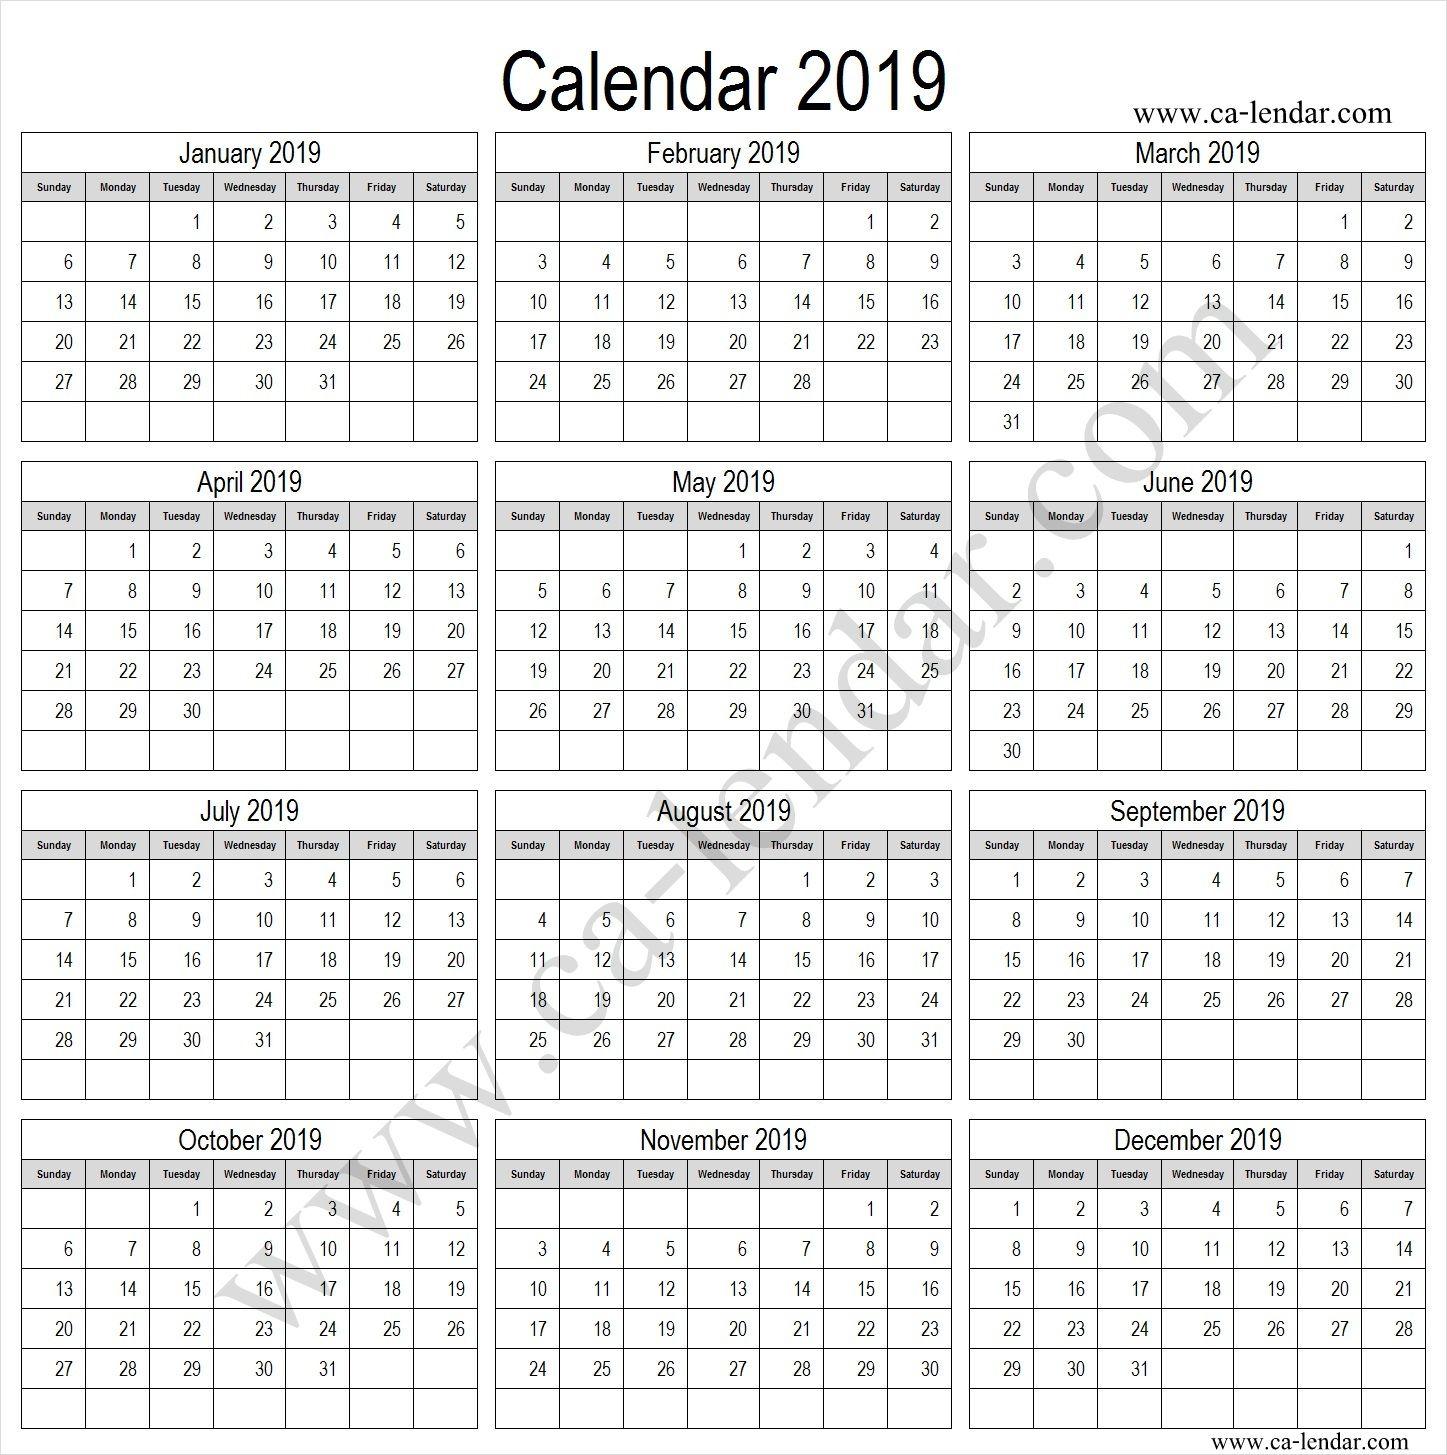 2019 Calendar Tumblr 2019 Calendar Template Pinterest 2019